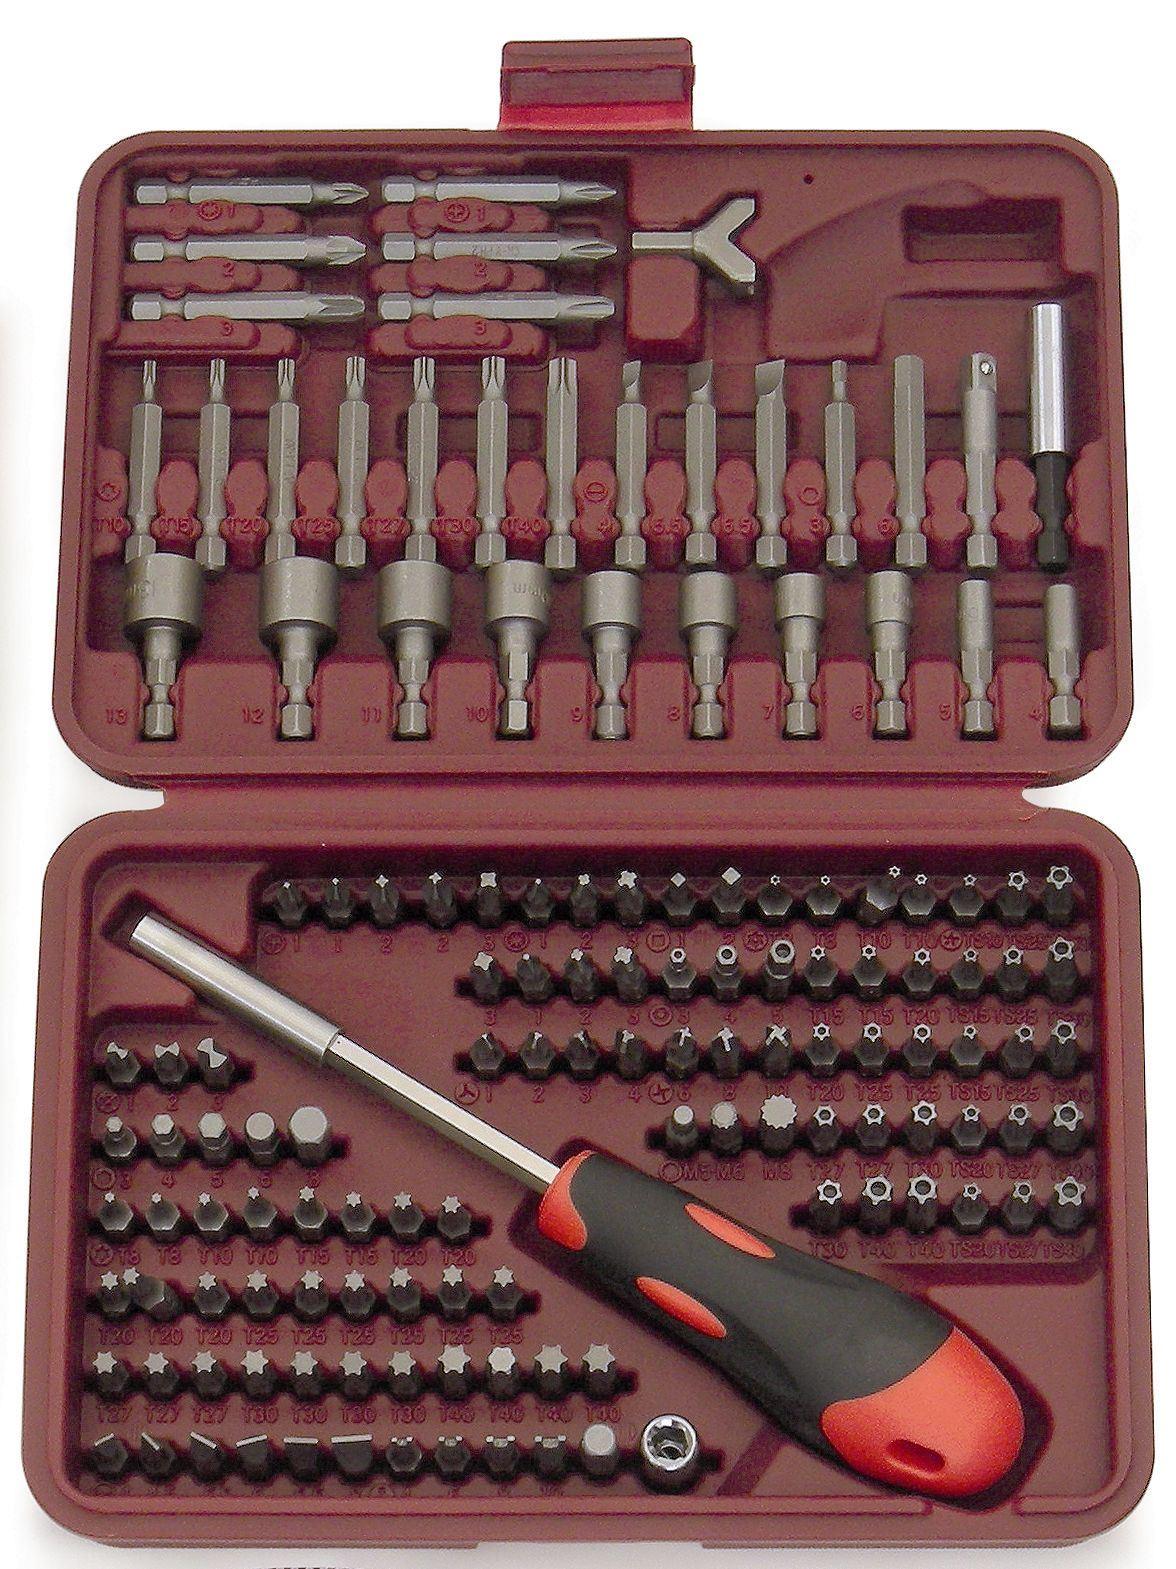 Box Fermec 138 inserti Image